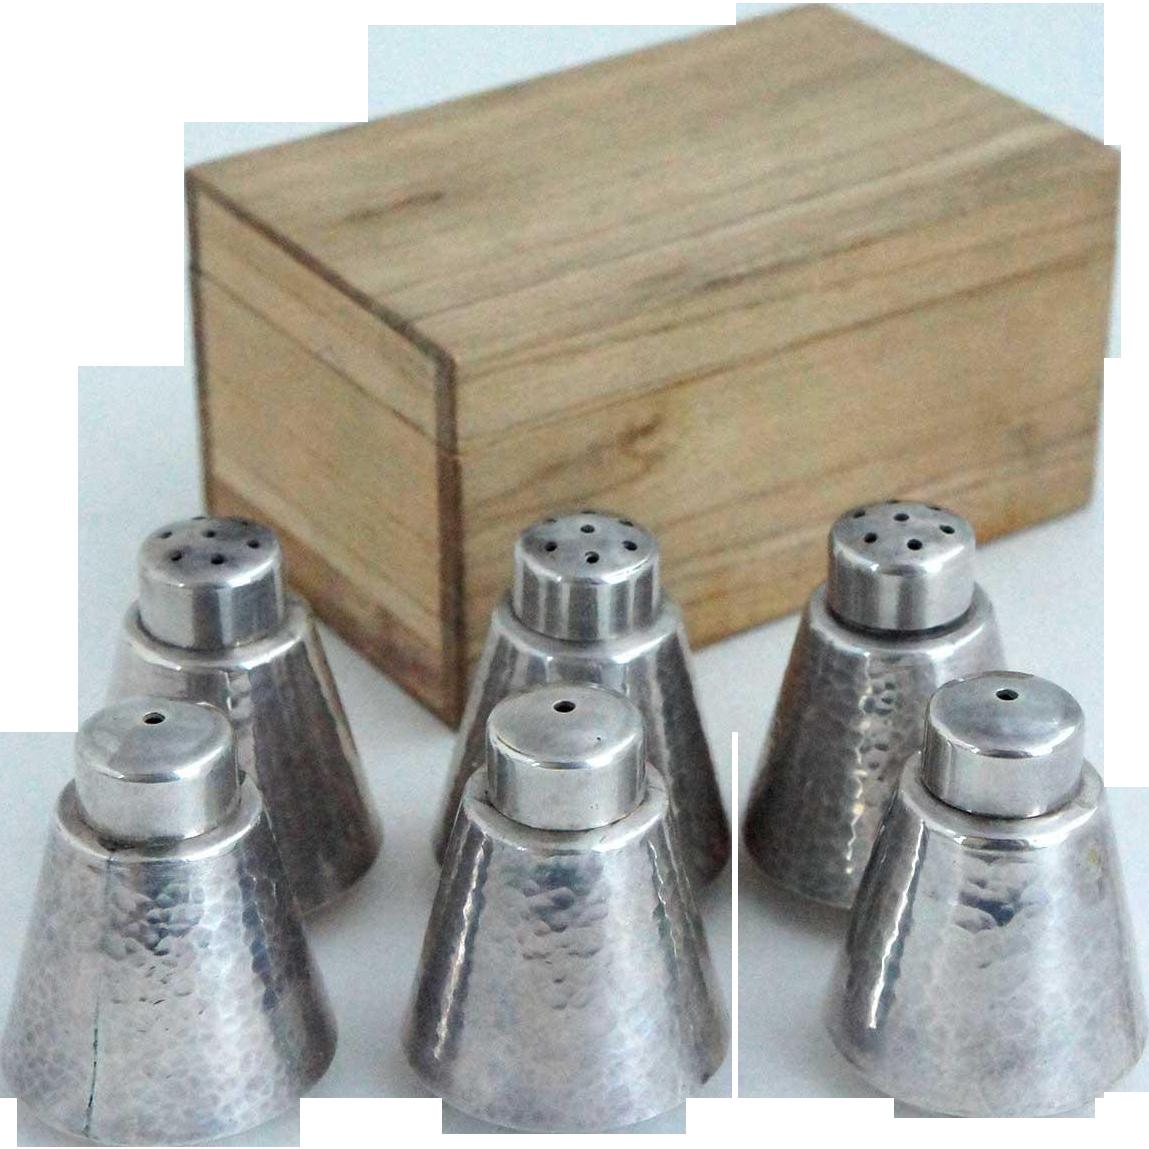 Three Pairs of Japanese Toyokoki Pure Silver Salt and Pepper Shakers with Kiri Wood Boxes